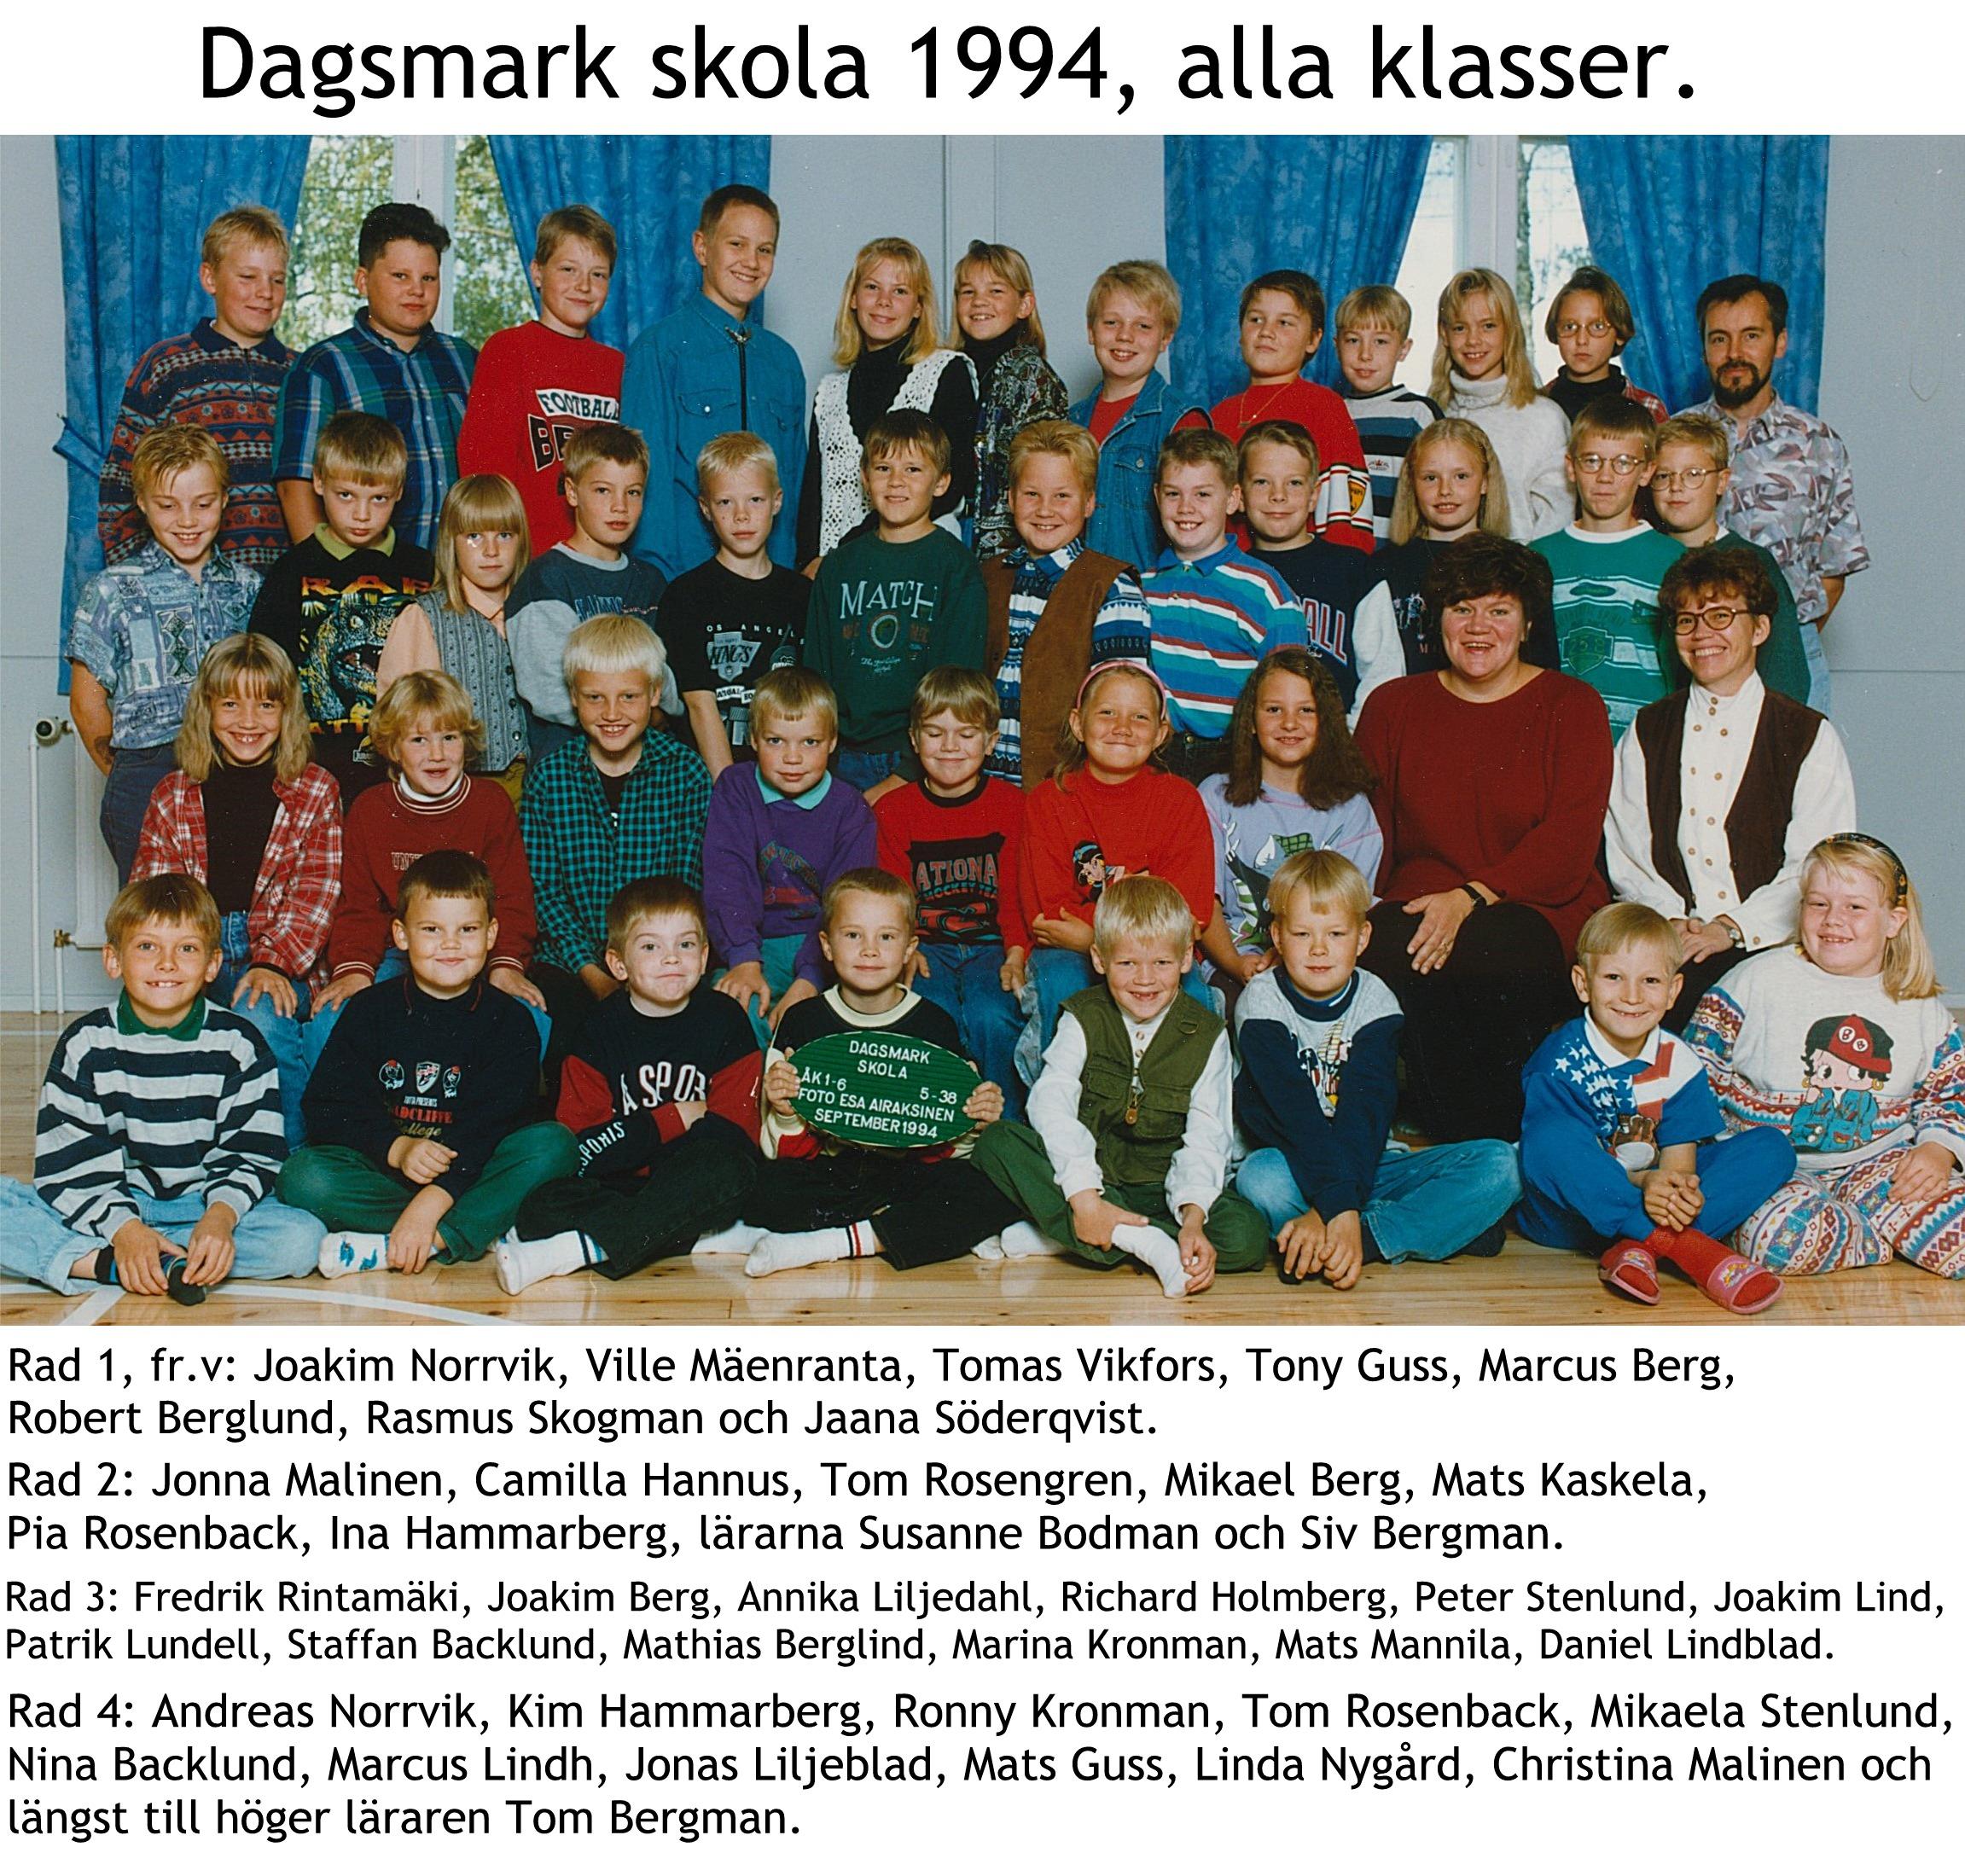 1994 Dagsmark skola alla klasser